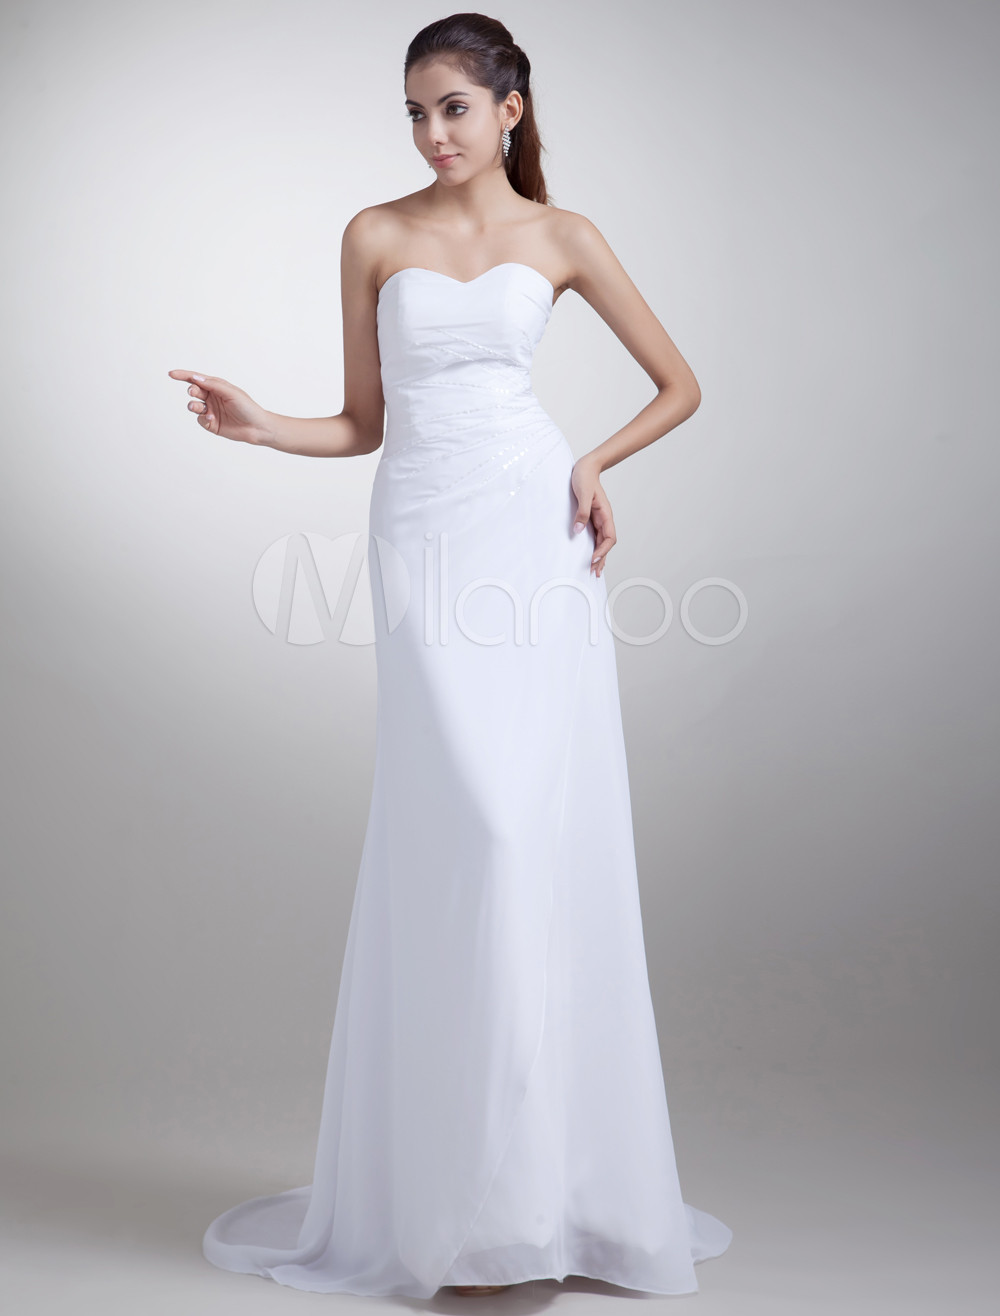 Modern White Sheath Strapless Beading Chiffon Bride's Wedding Dress photo